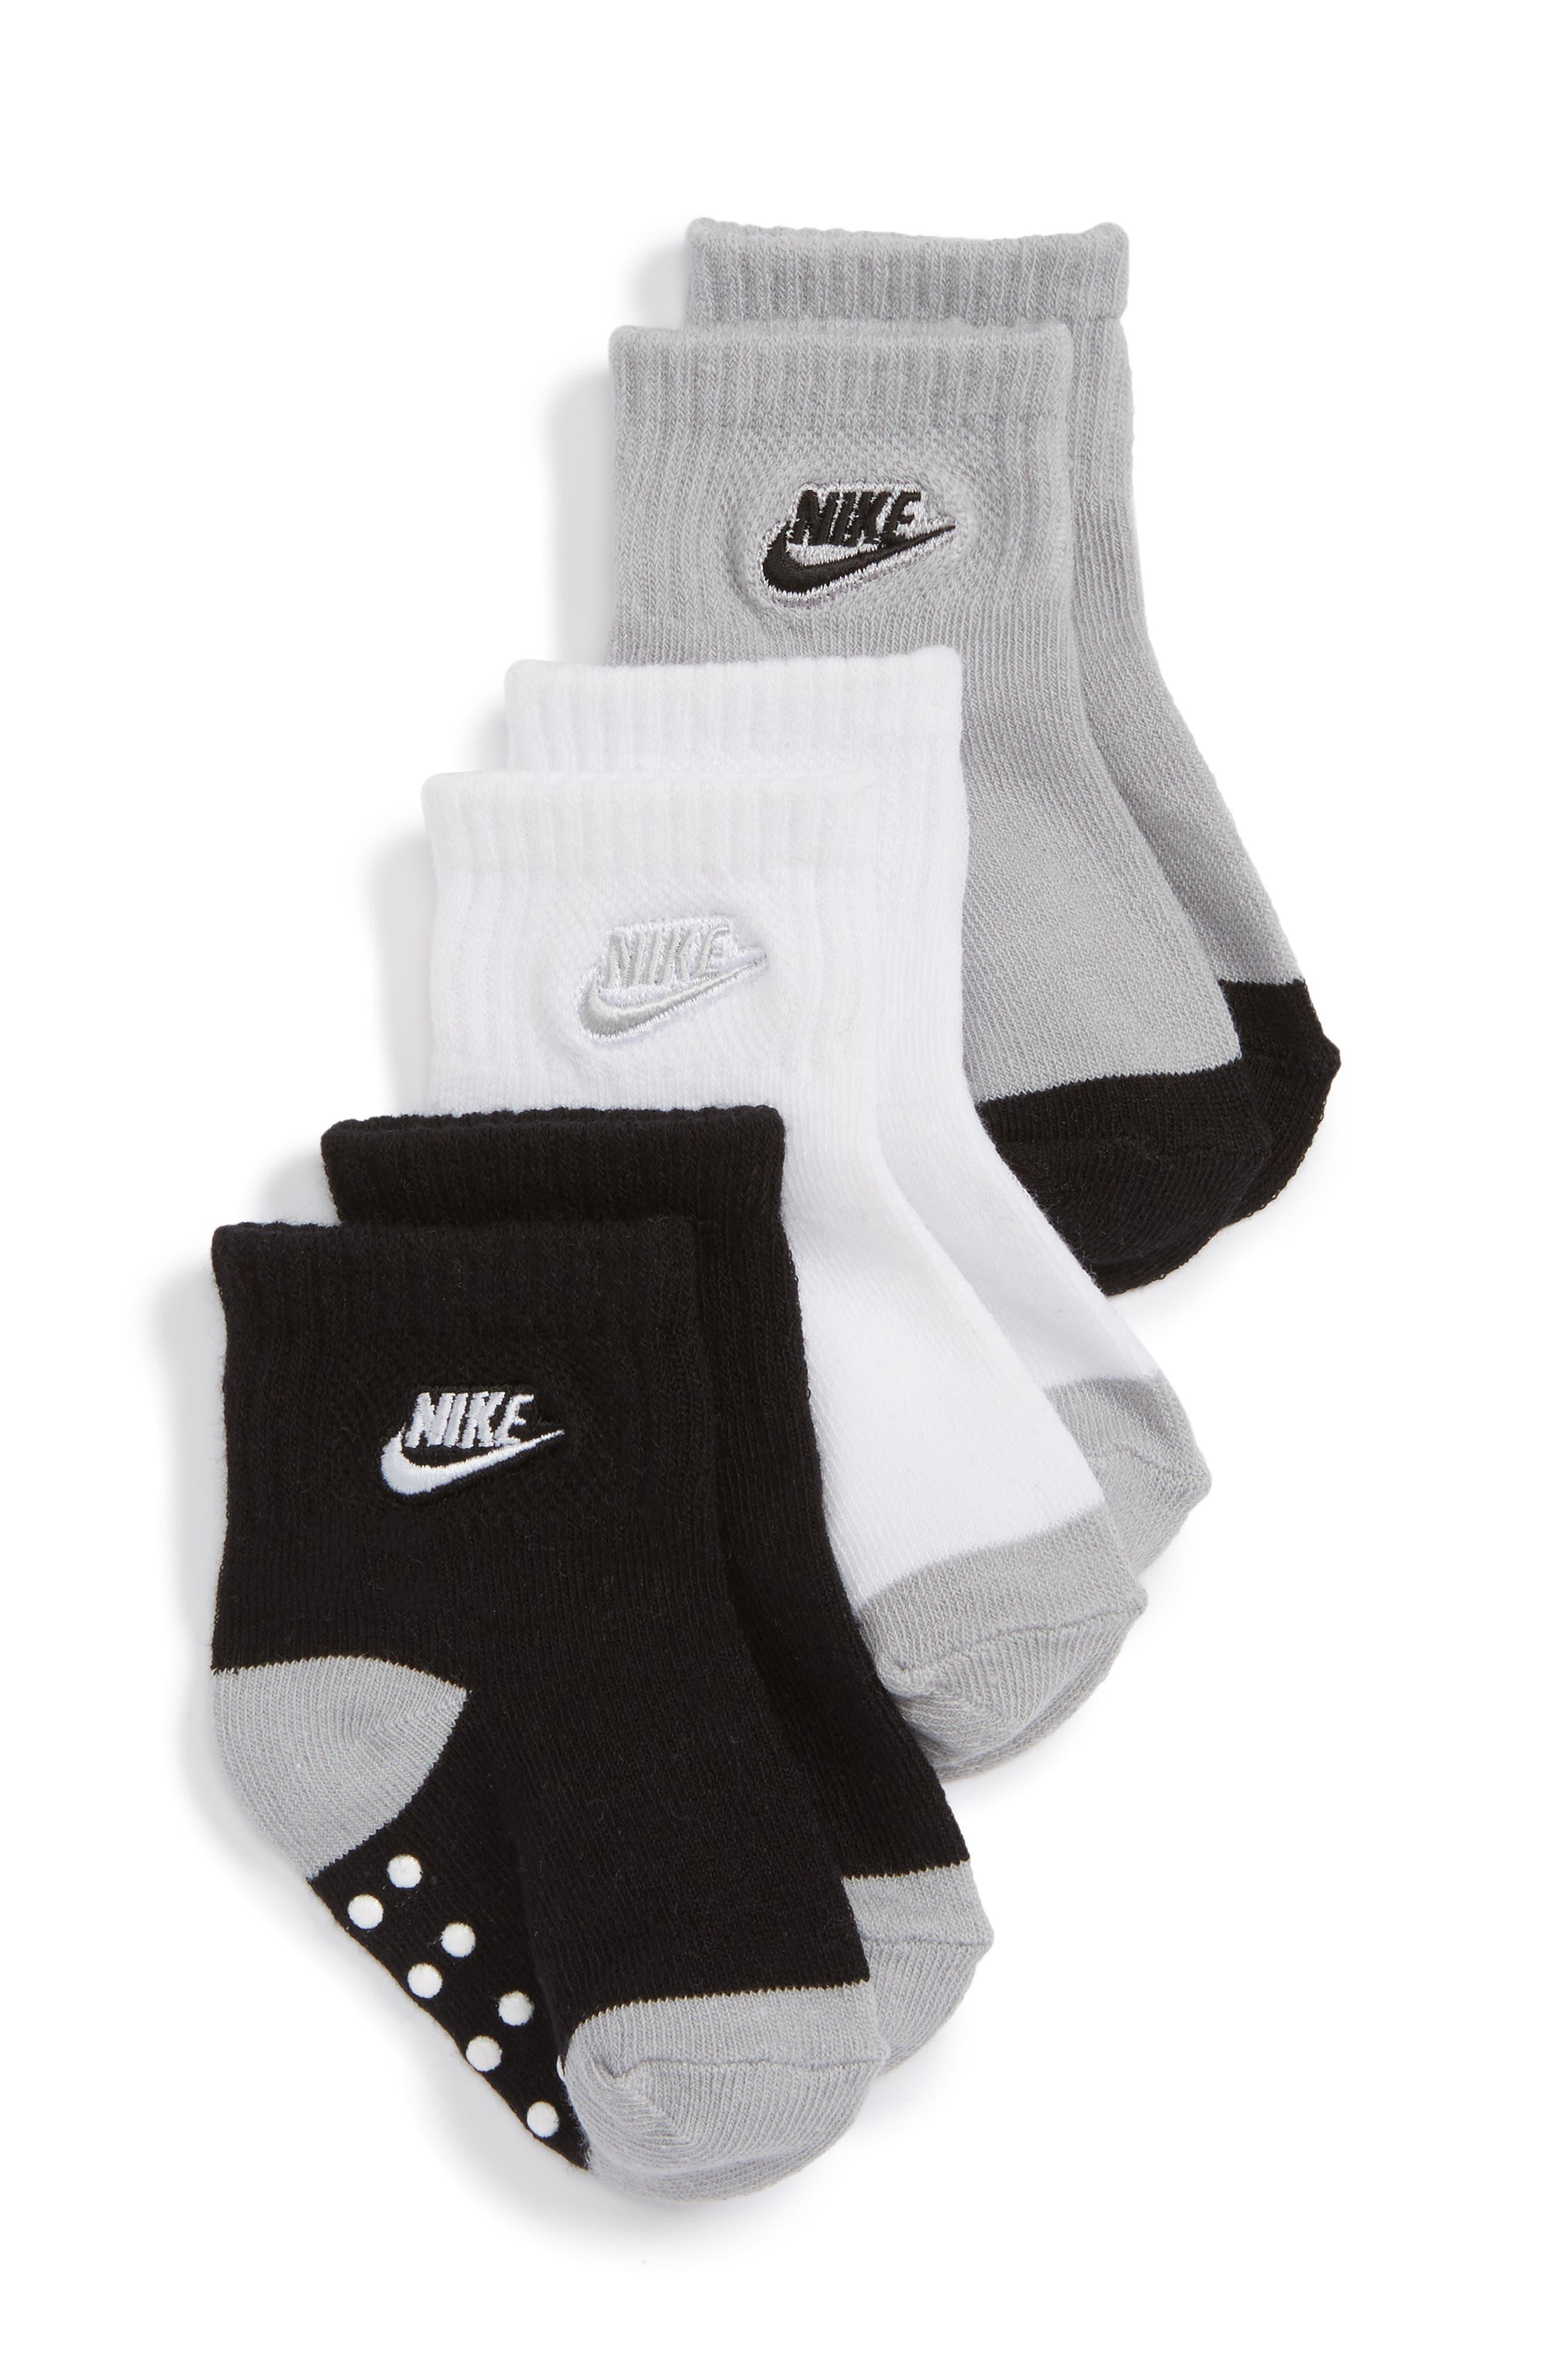 Alternate Image 1 Selected - Nike Futura 3-Pack Gripper Socks (Baby)